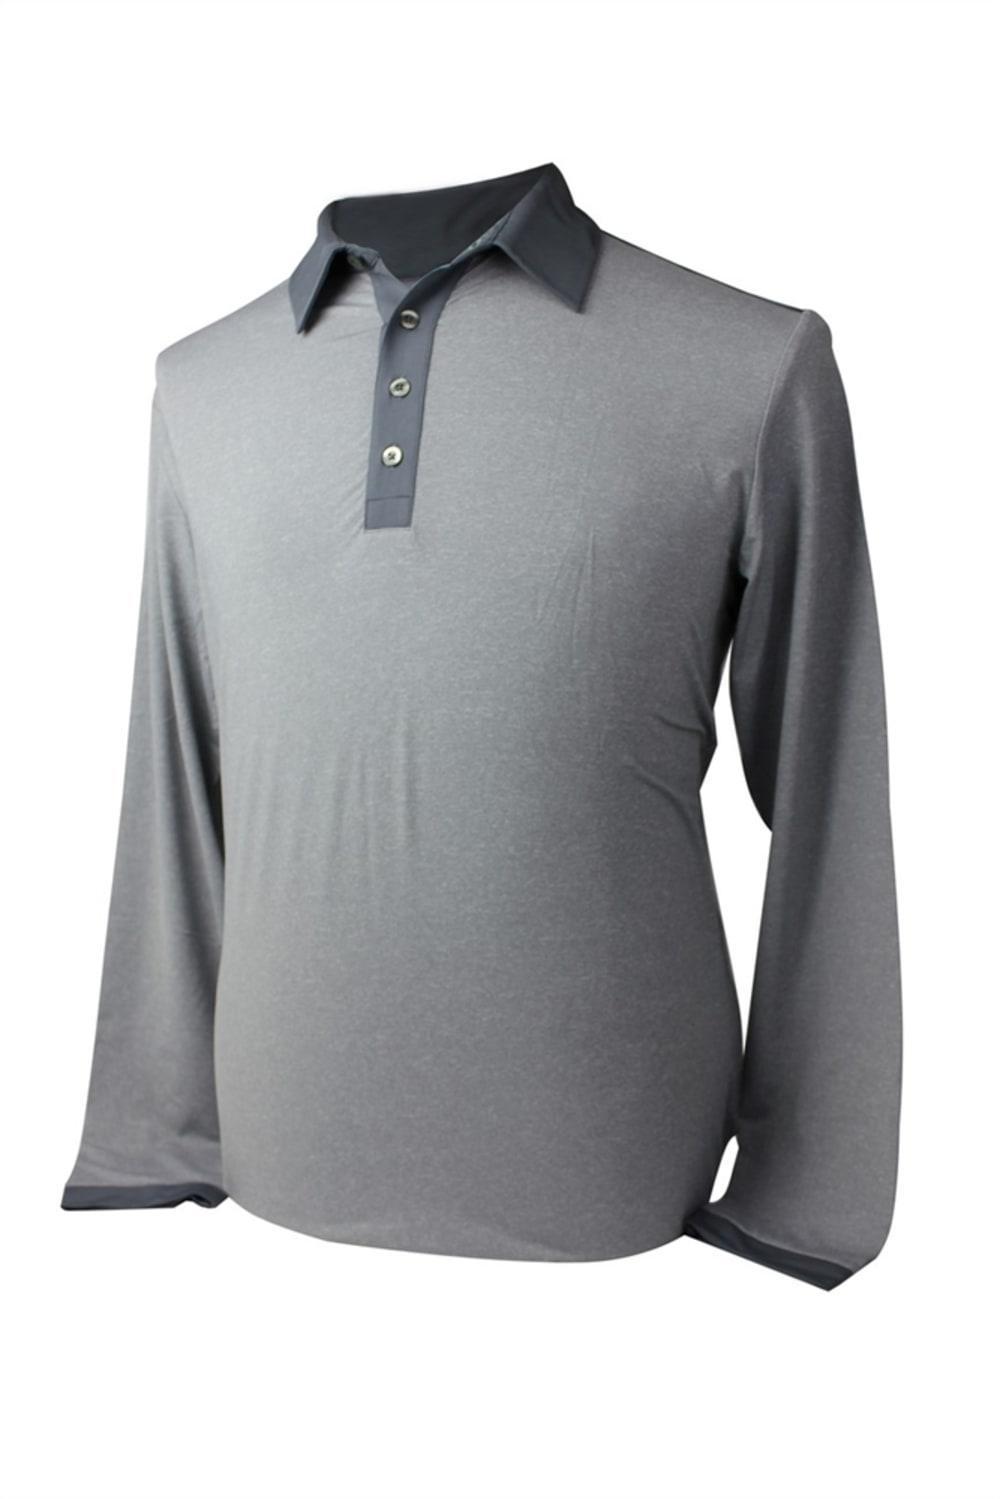 bcaa5355 Adidas Mens AdiPure Heather Long Sleeve Polo